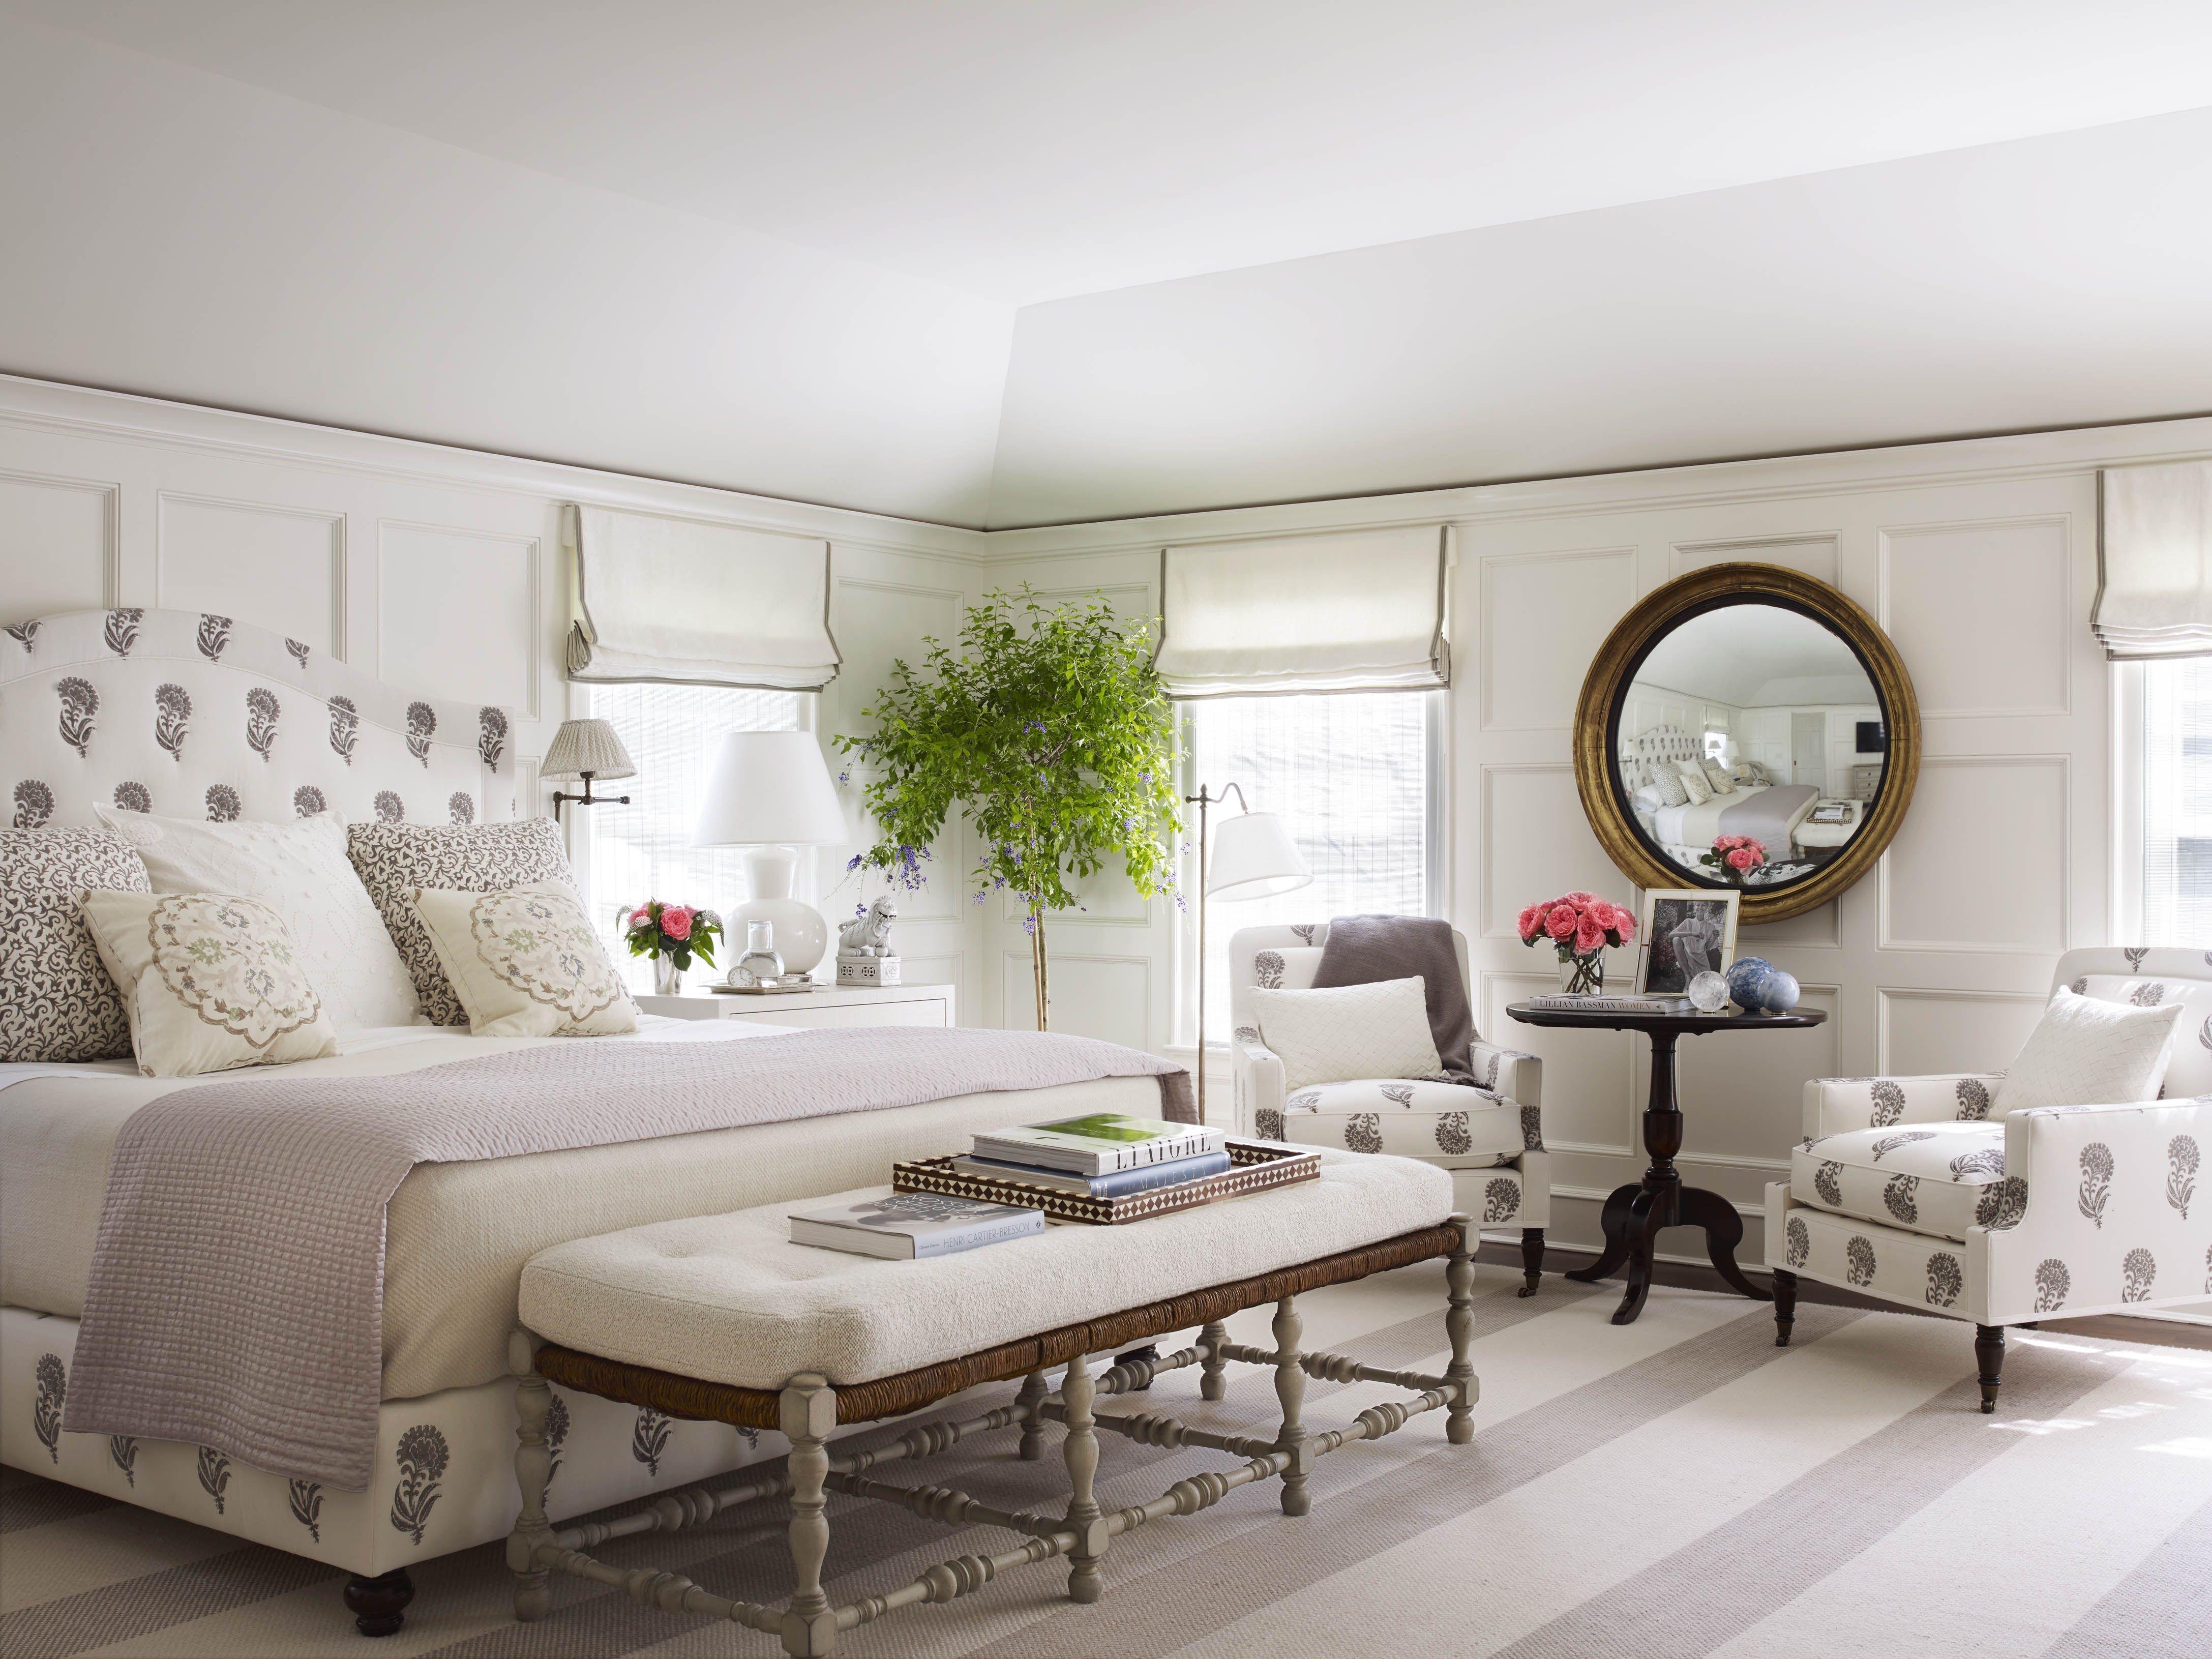 18 White Bedroom Ideas   Luxury White Bedroom Designs And Decor